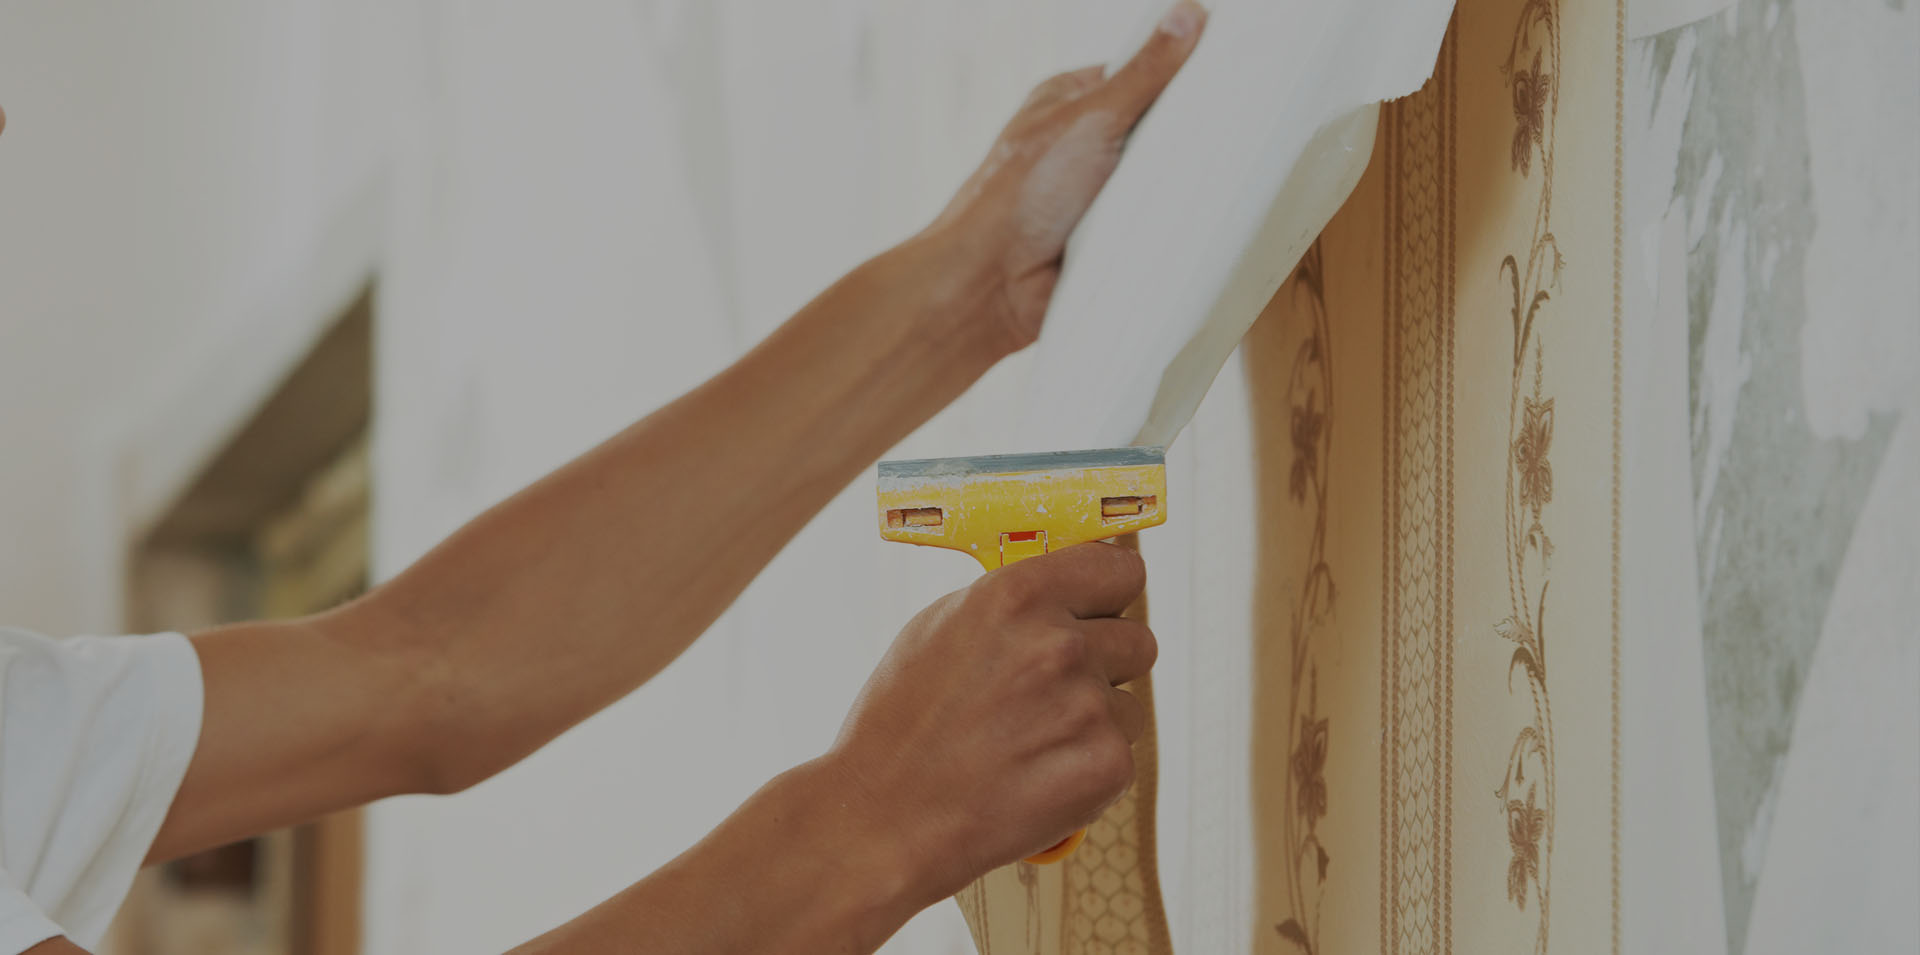 Wallpaper Removal Process